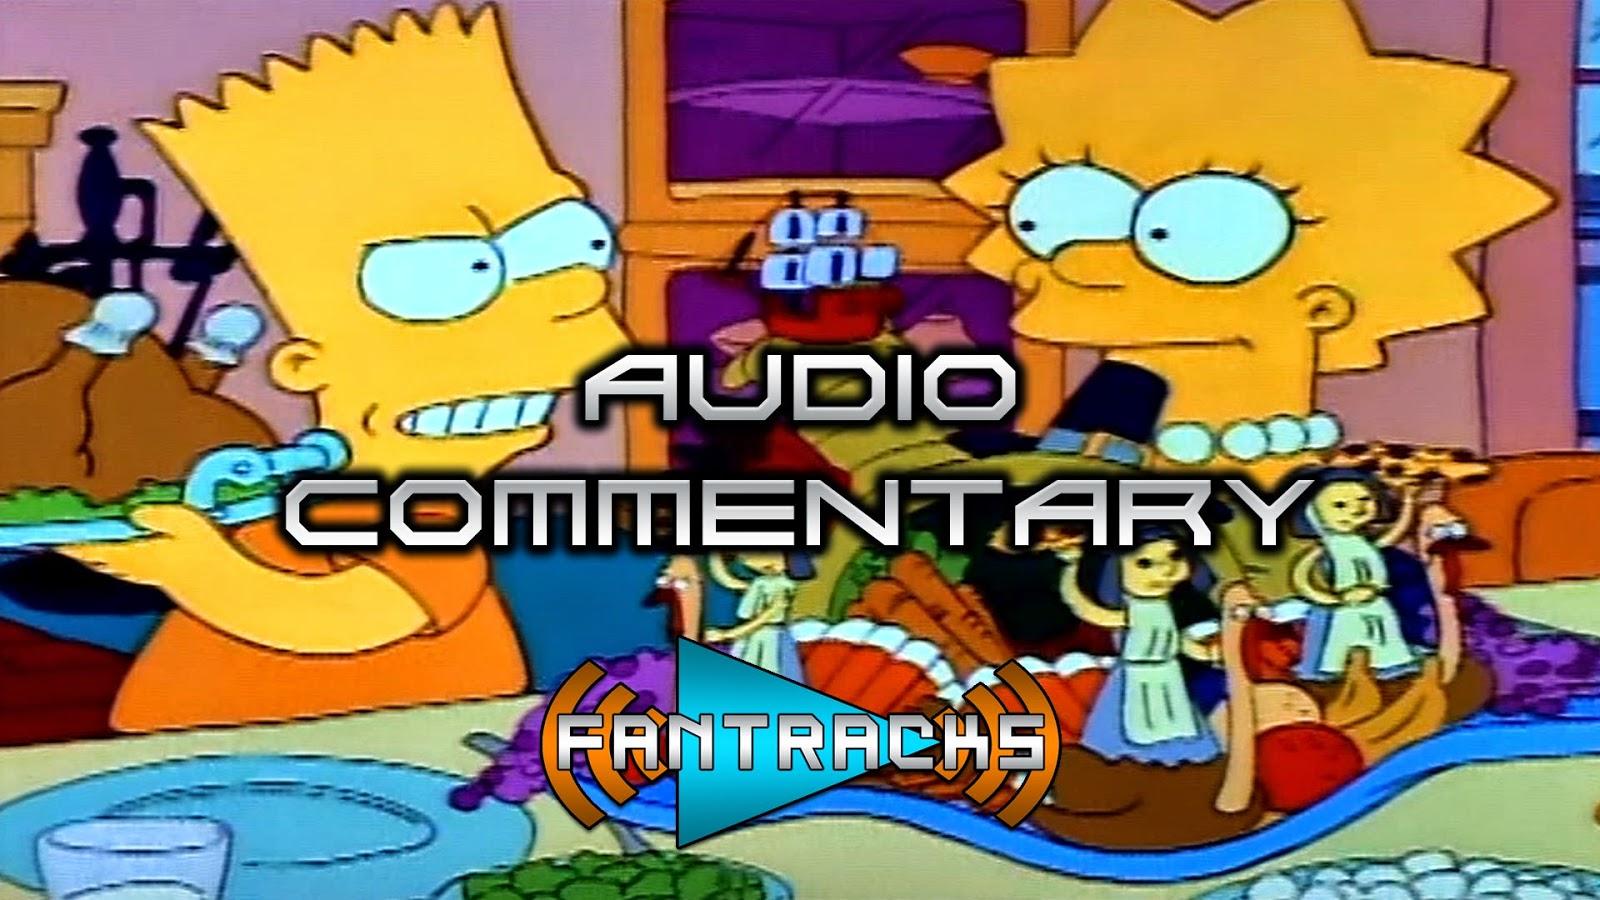 FanTracks Thanksgiving Simpsons audio commentary season 2 episode 7